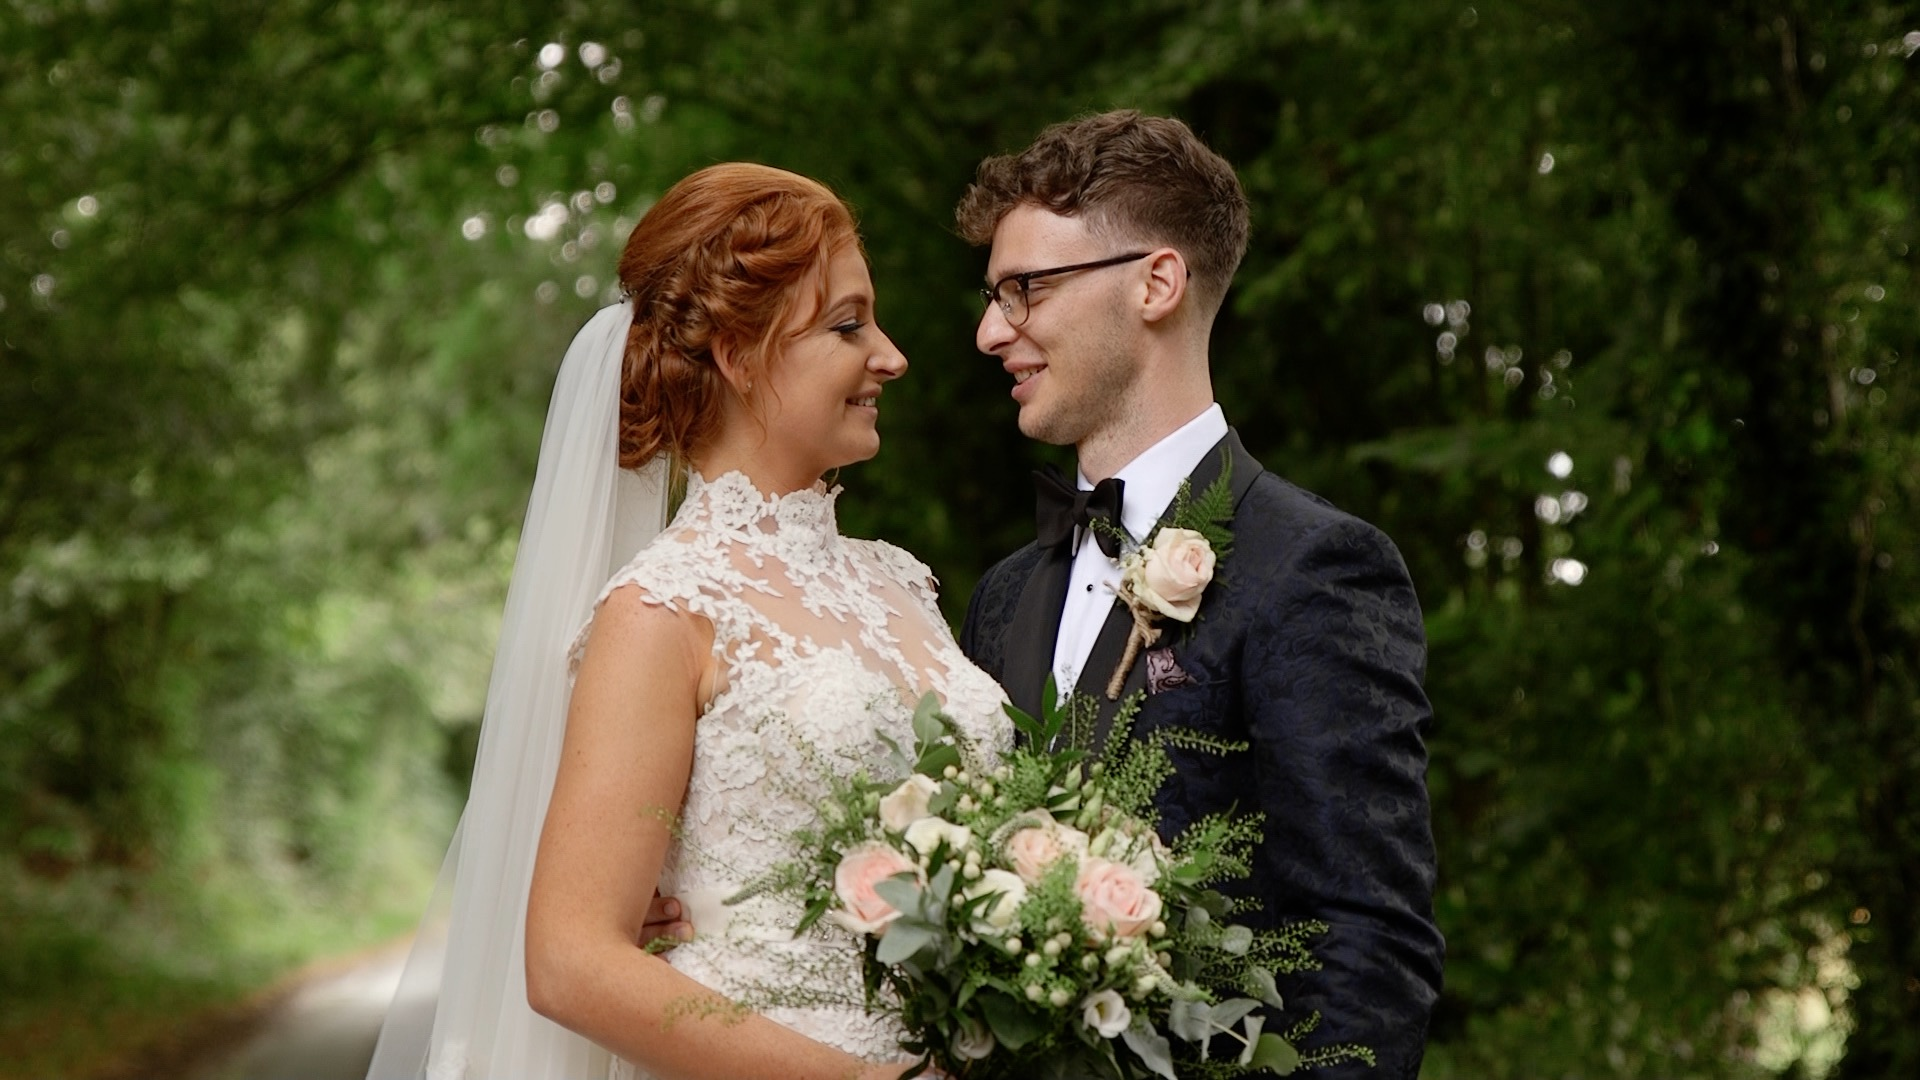 Staffordshire Farm Weddings